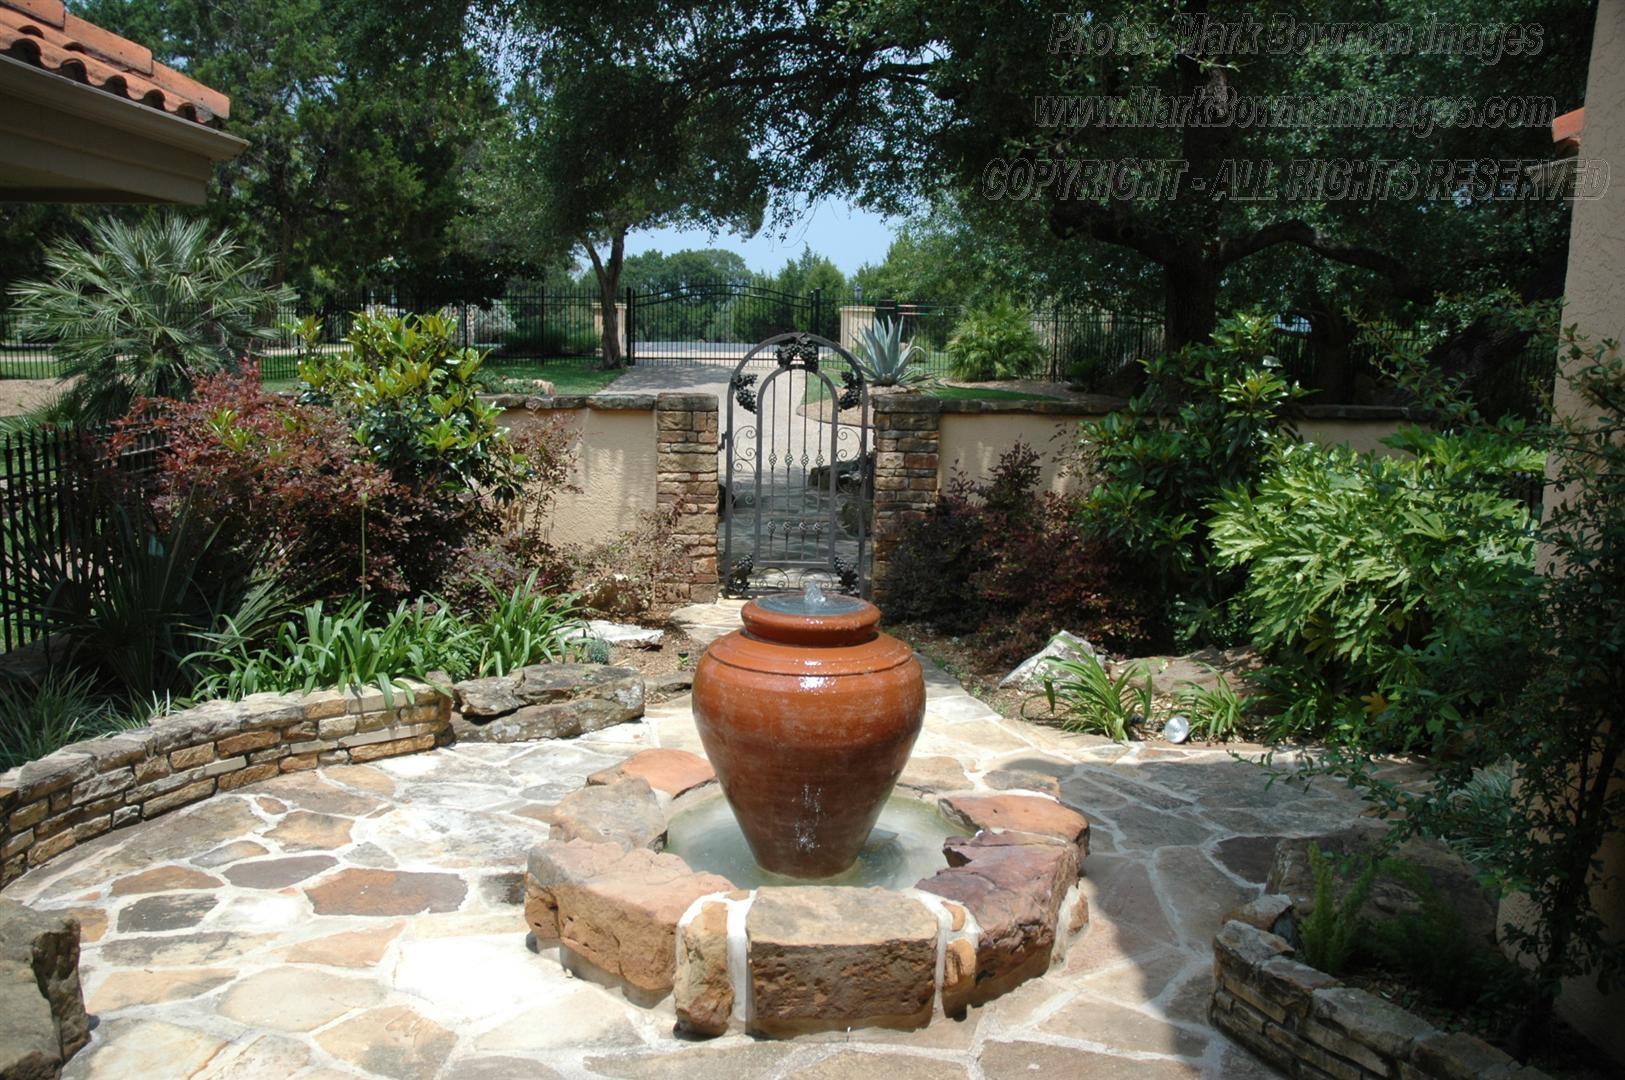 Villa Paradiso in Austin Texas